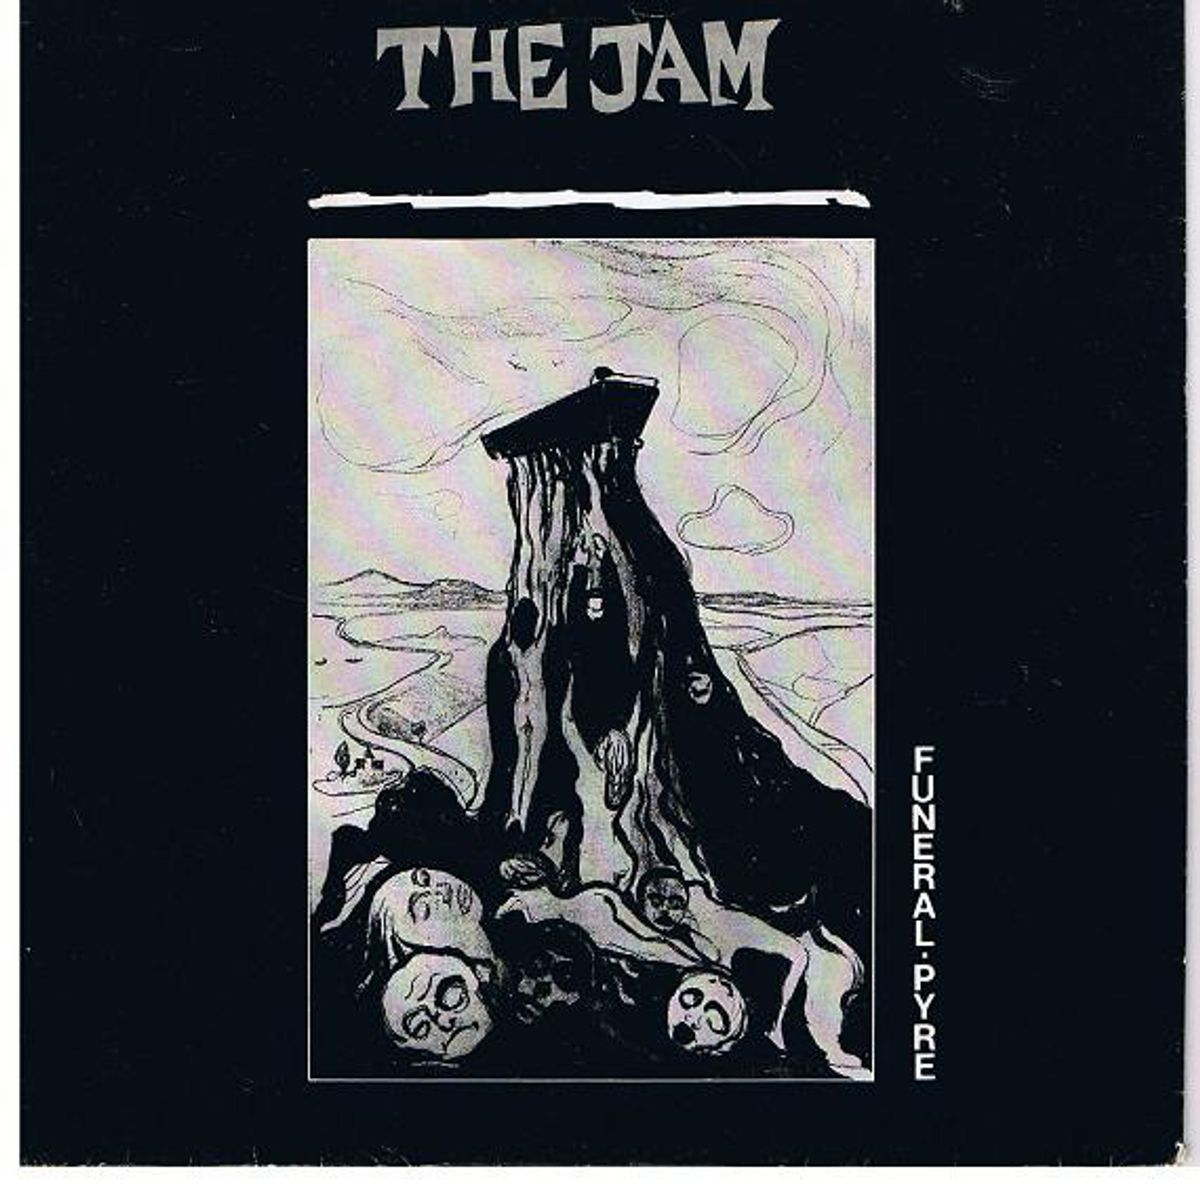 #RickenbackerRules - The Jam - Funeral Pyre (1981)